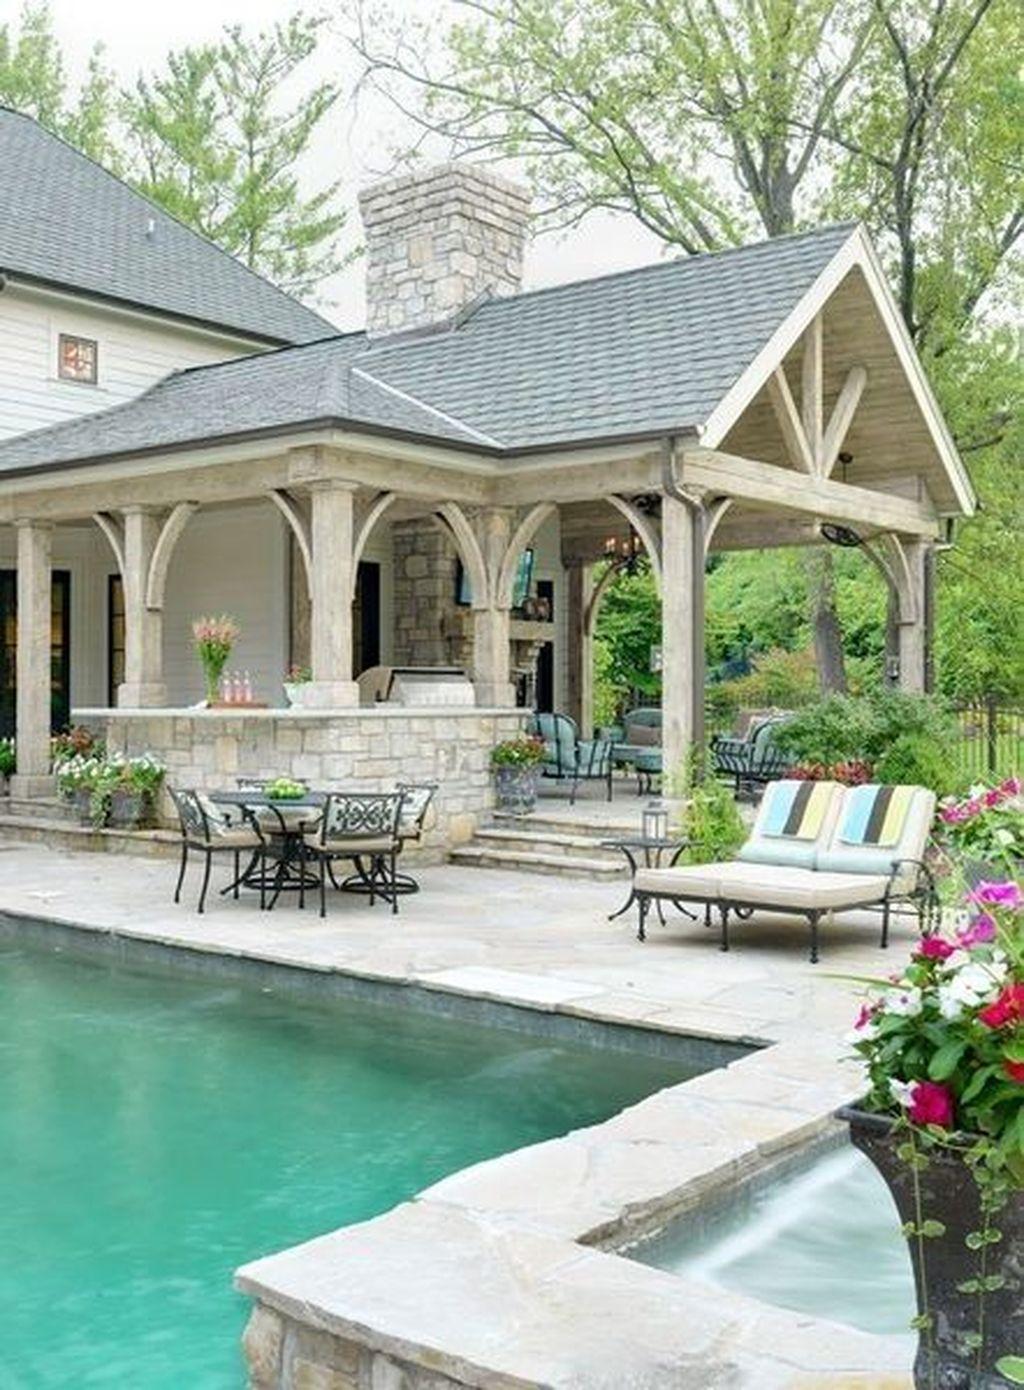 Stunning Outdoor Kitchen Design Ideas For Perfect Summer 09